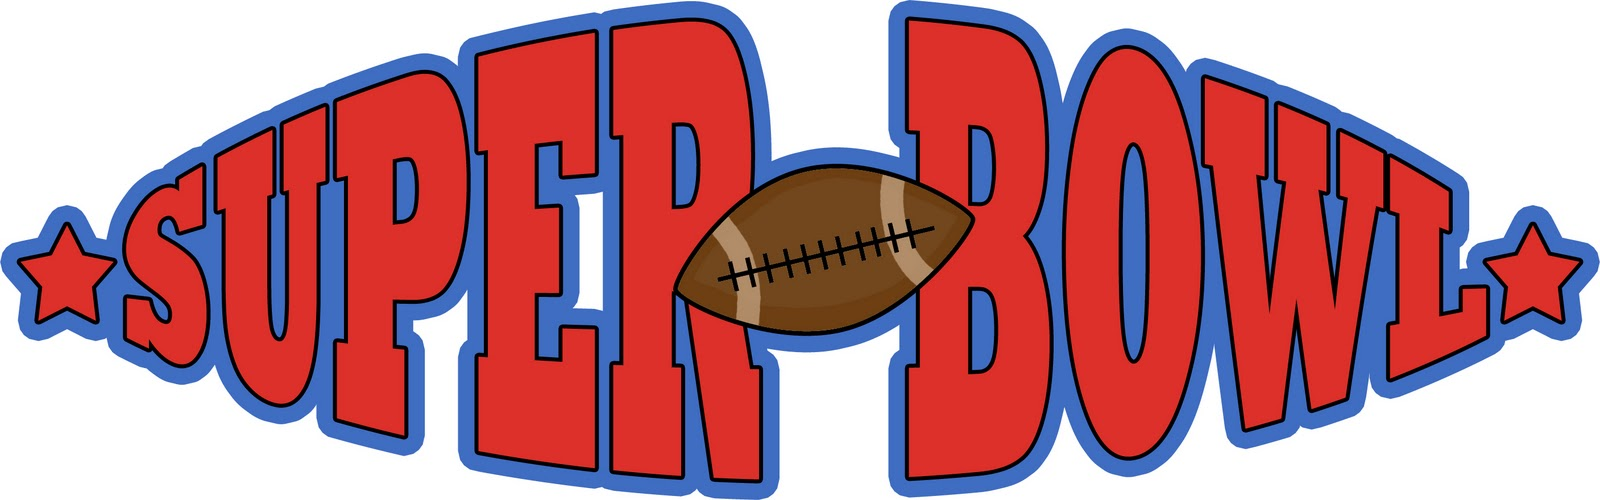 1600x500 Super Bowl Football Banners Clipart